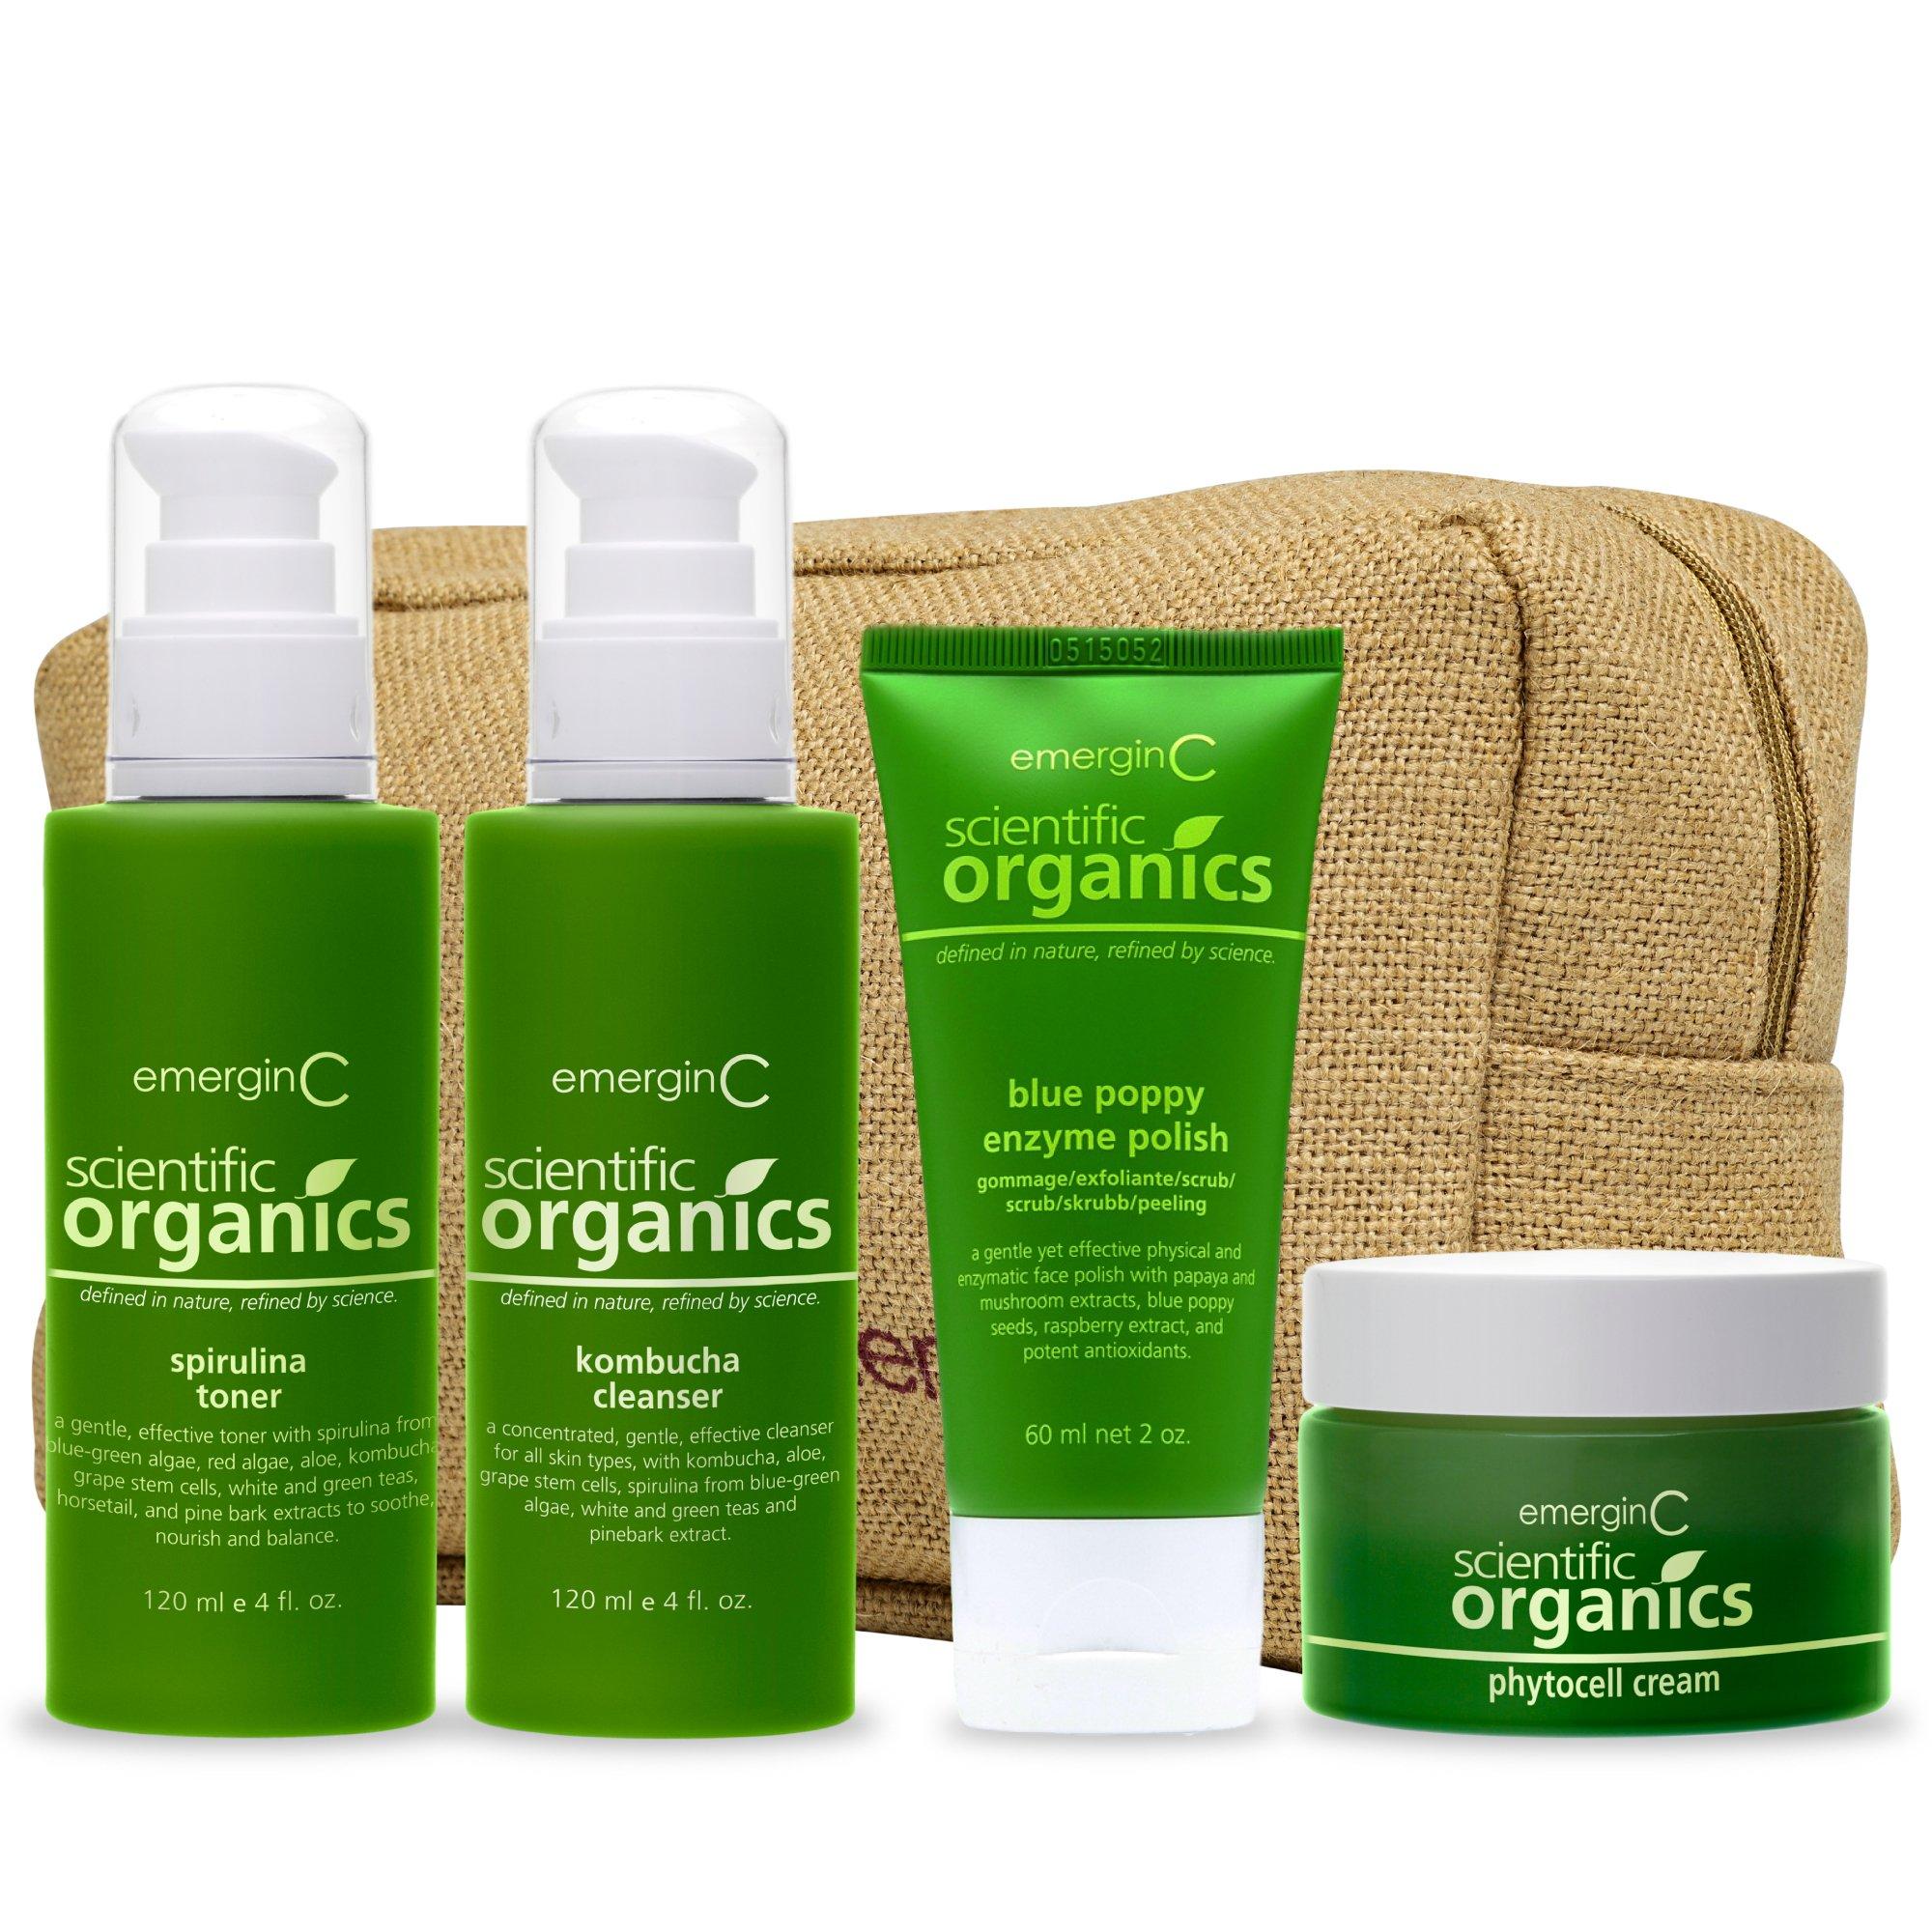 emerginC Scientific Organics - Natural Skin Care Trial/Travel Set